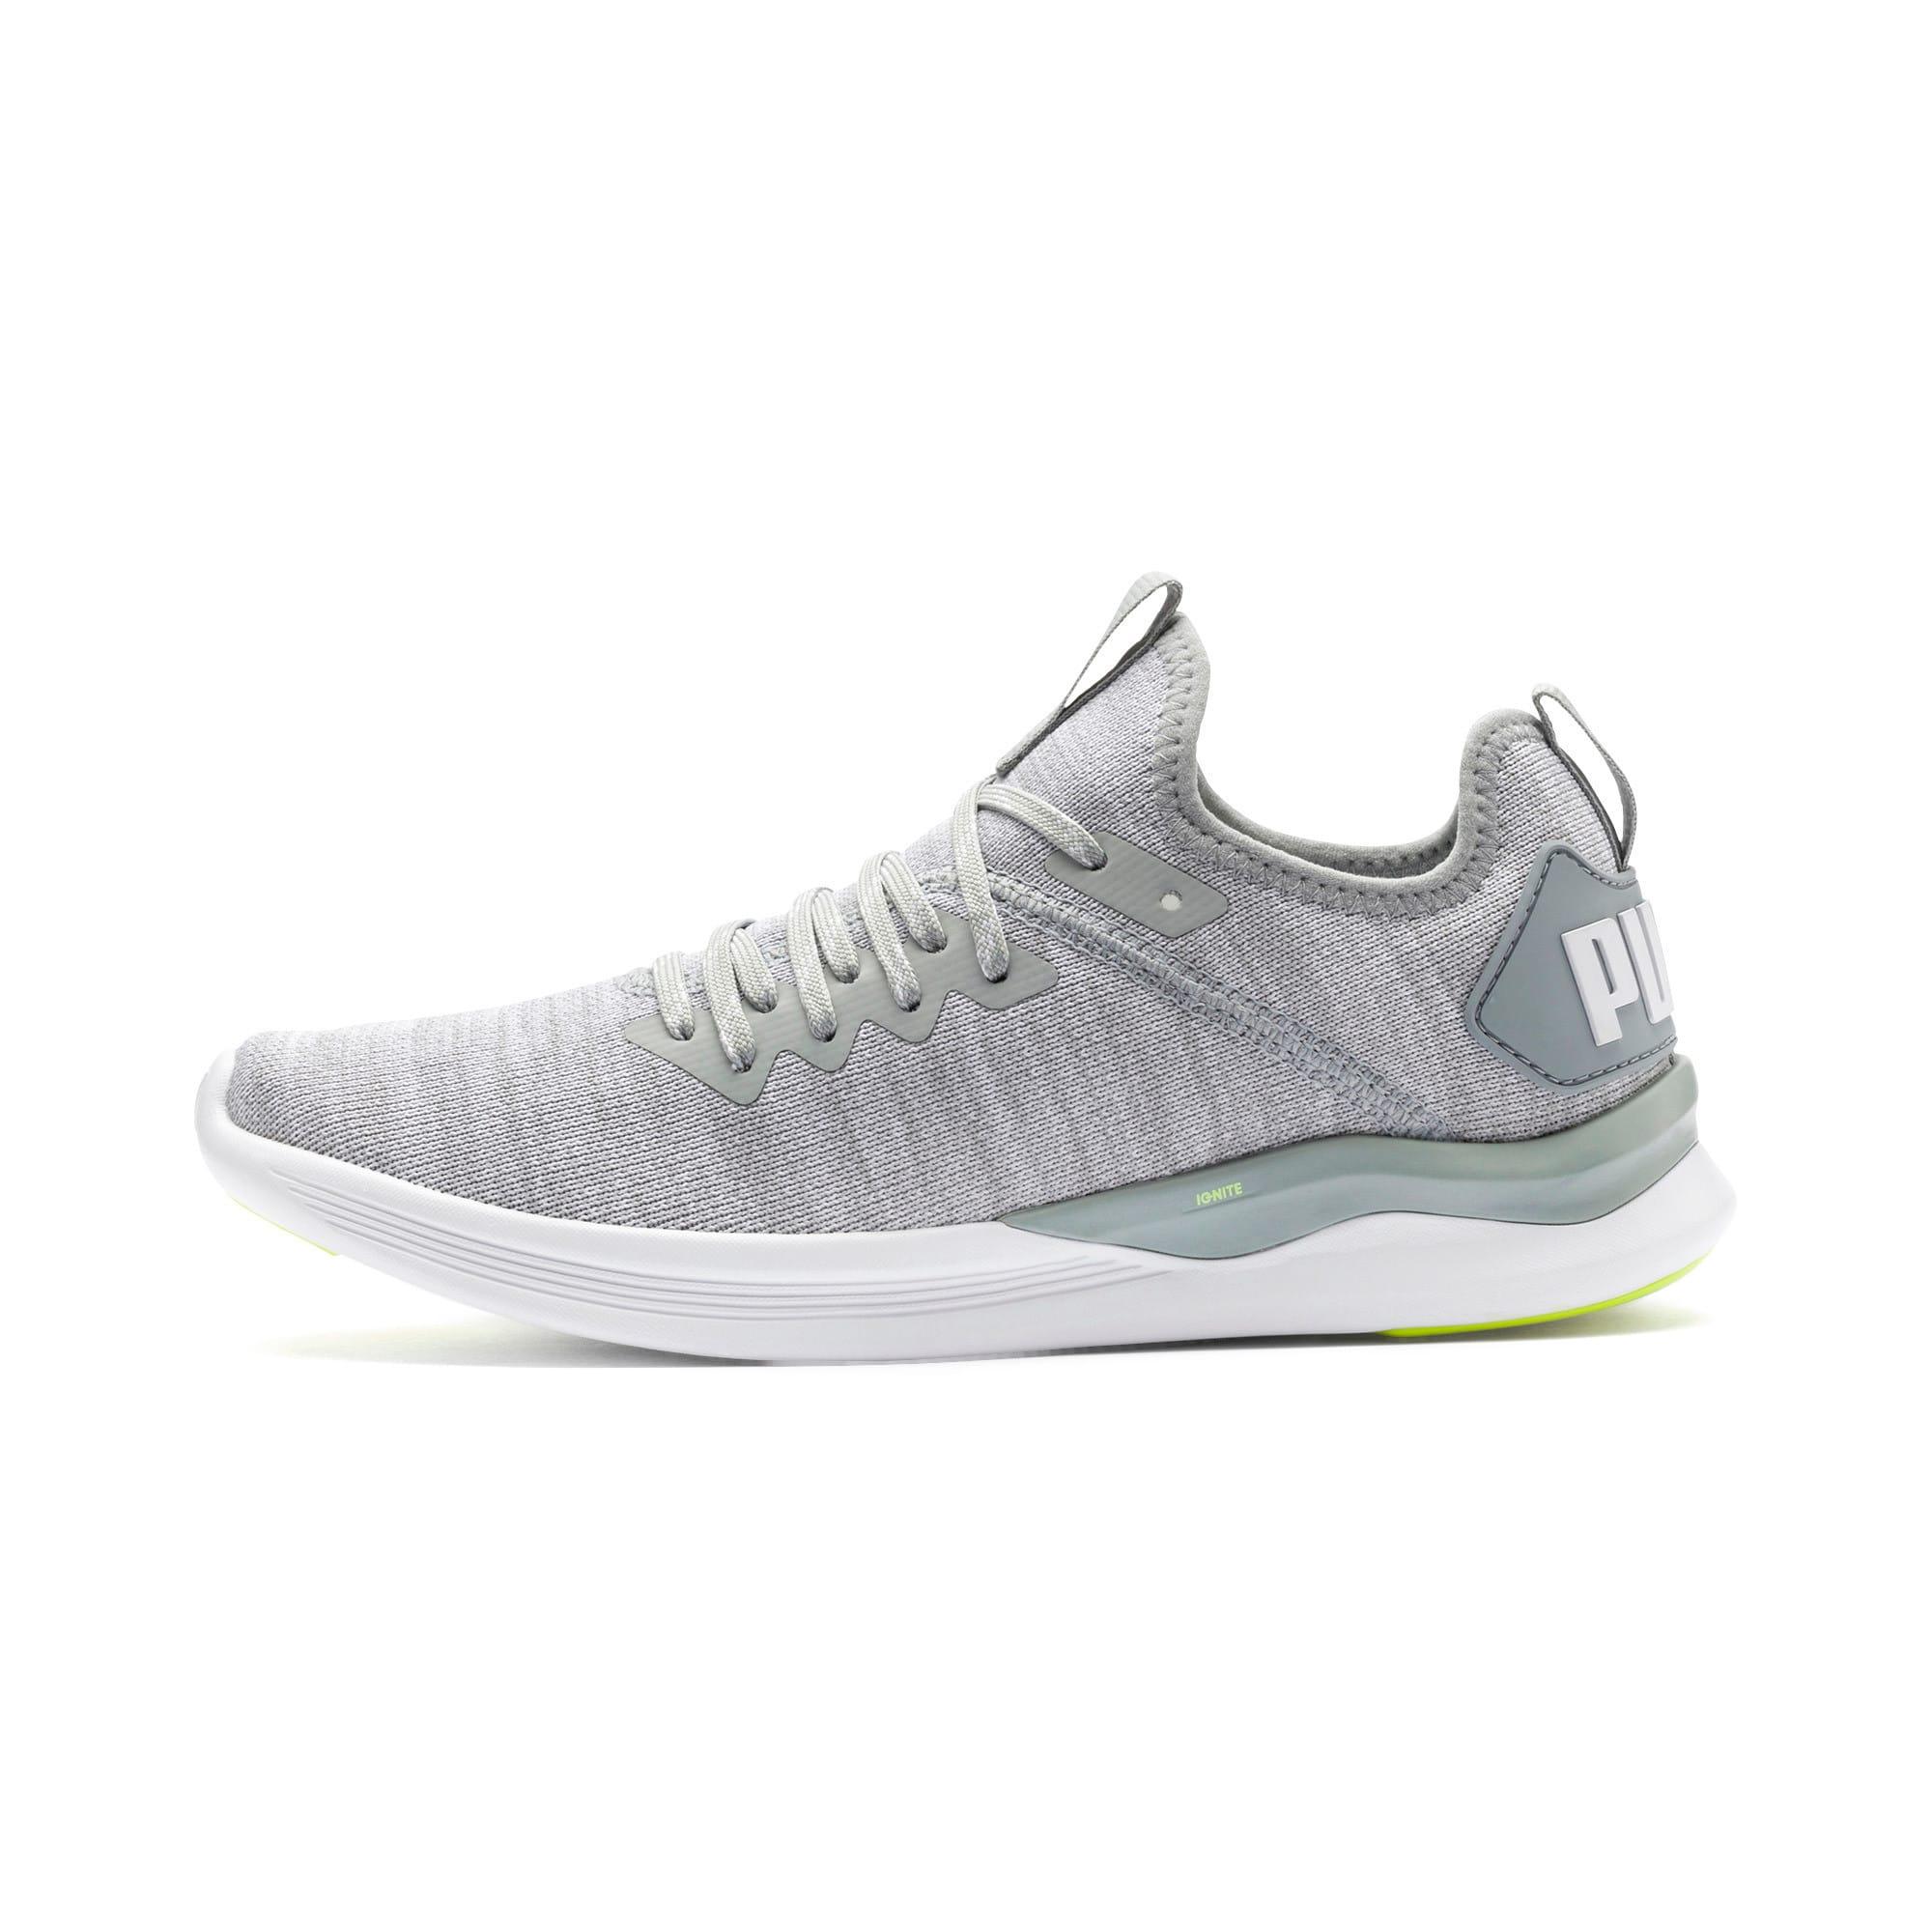 Thumbnail 1 of IGNITE Flash evoKNIT Women's Running Shoes, Quarry-White-Milky Blue, medium